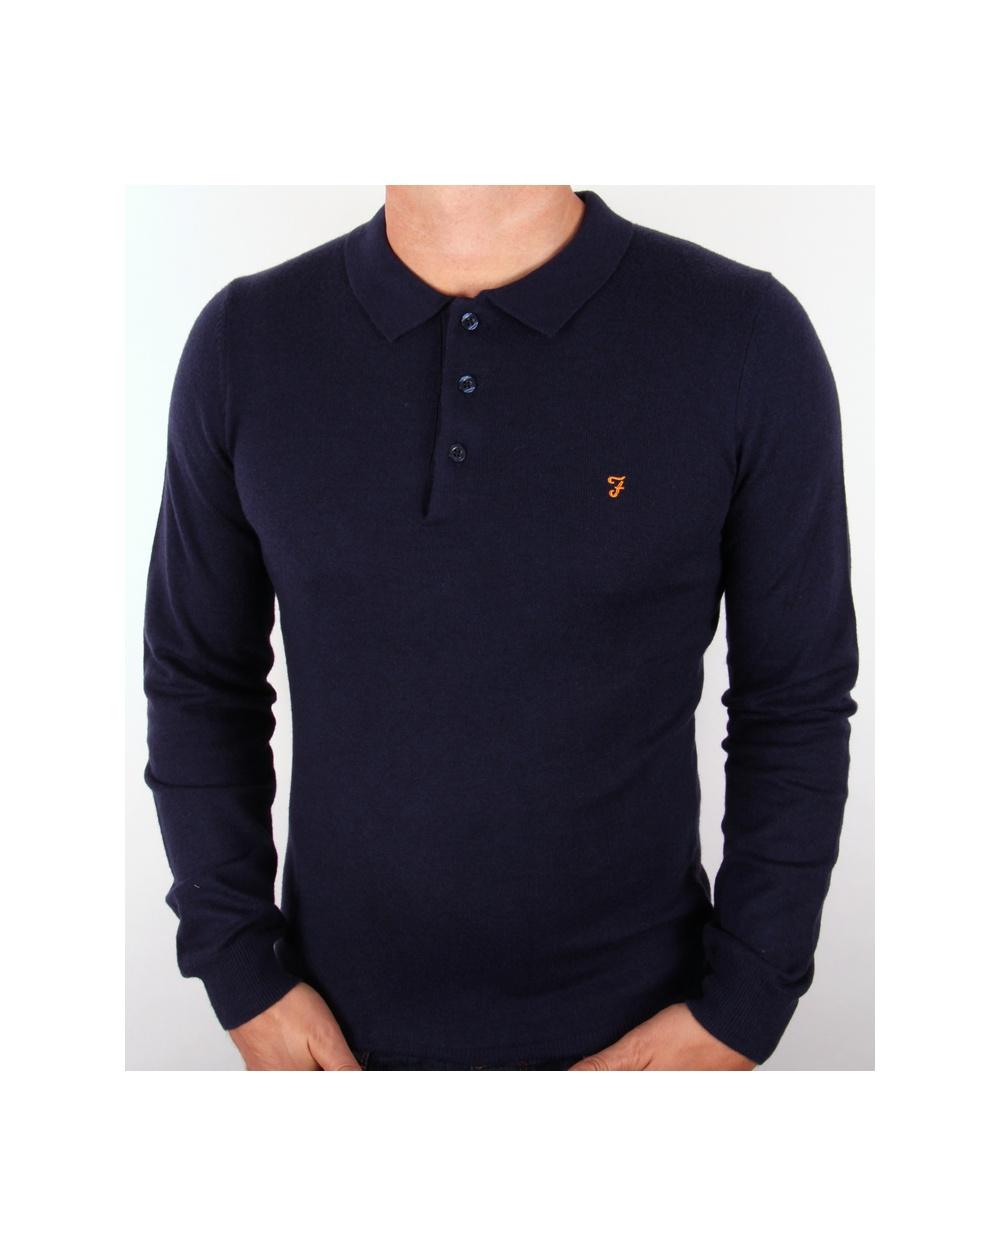 45e9f481 Farah Affery Knitted Polo Shirt Navy Blue